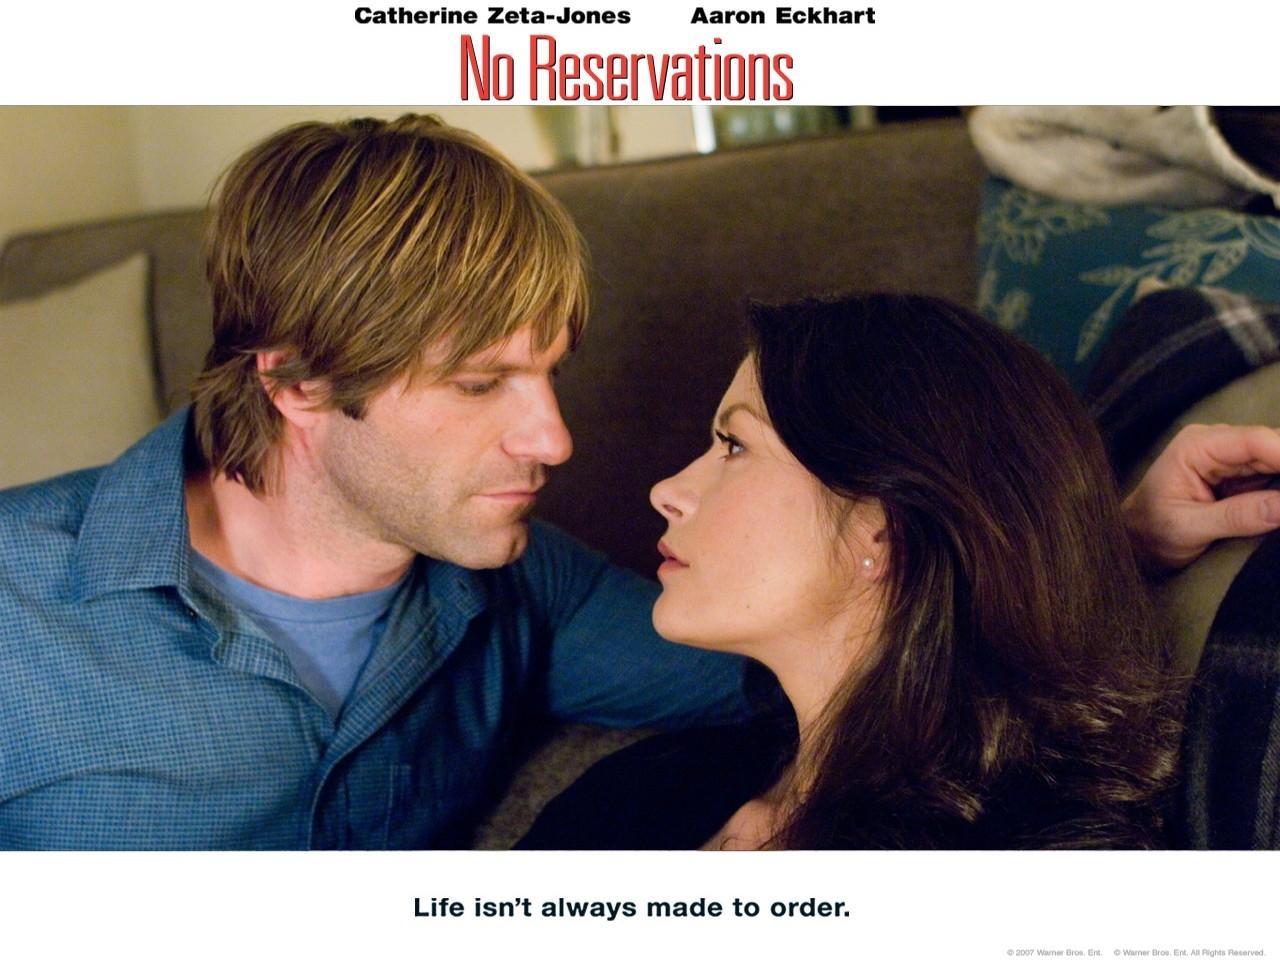 Wallpaper del film No Reservations: Aaron Eckhart e Catherine Zeta-Jones